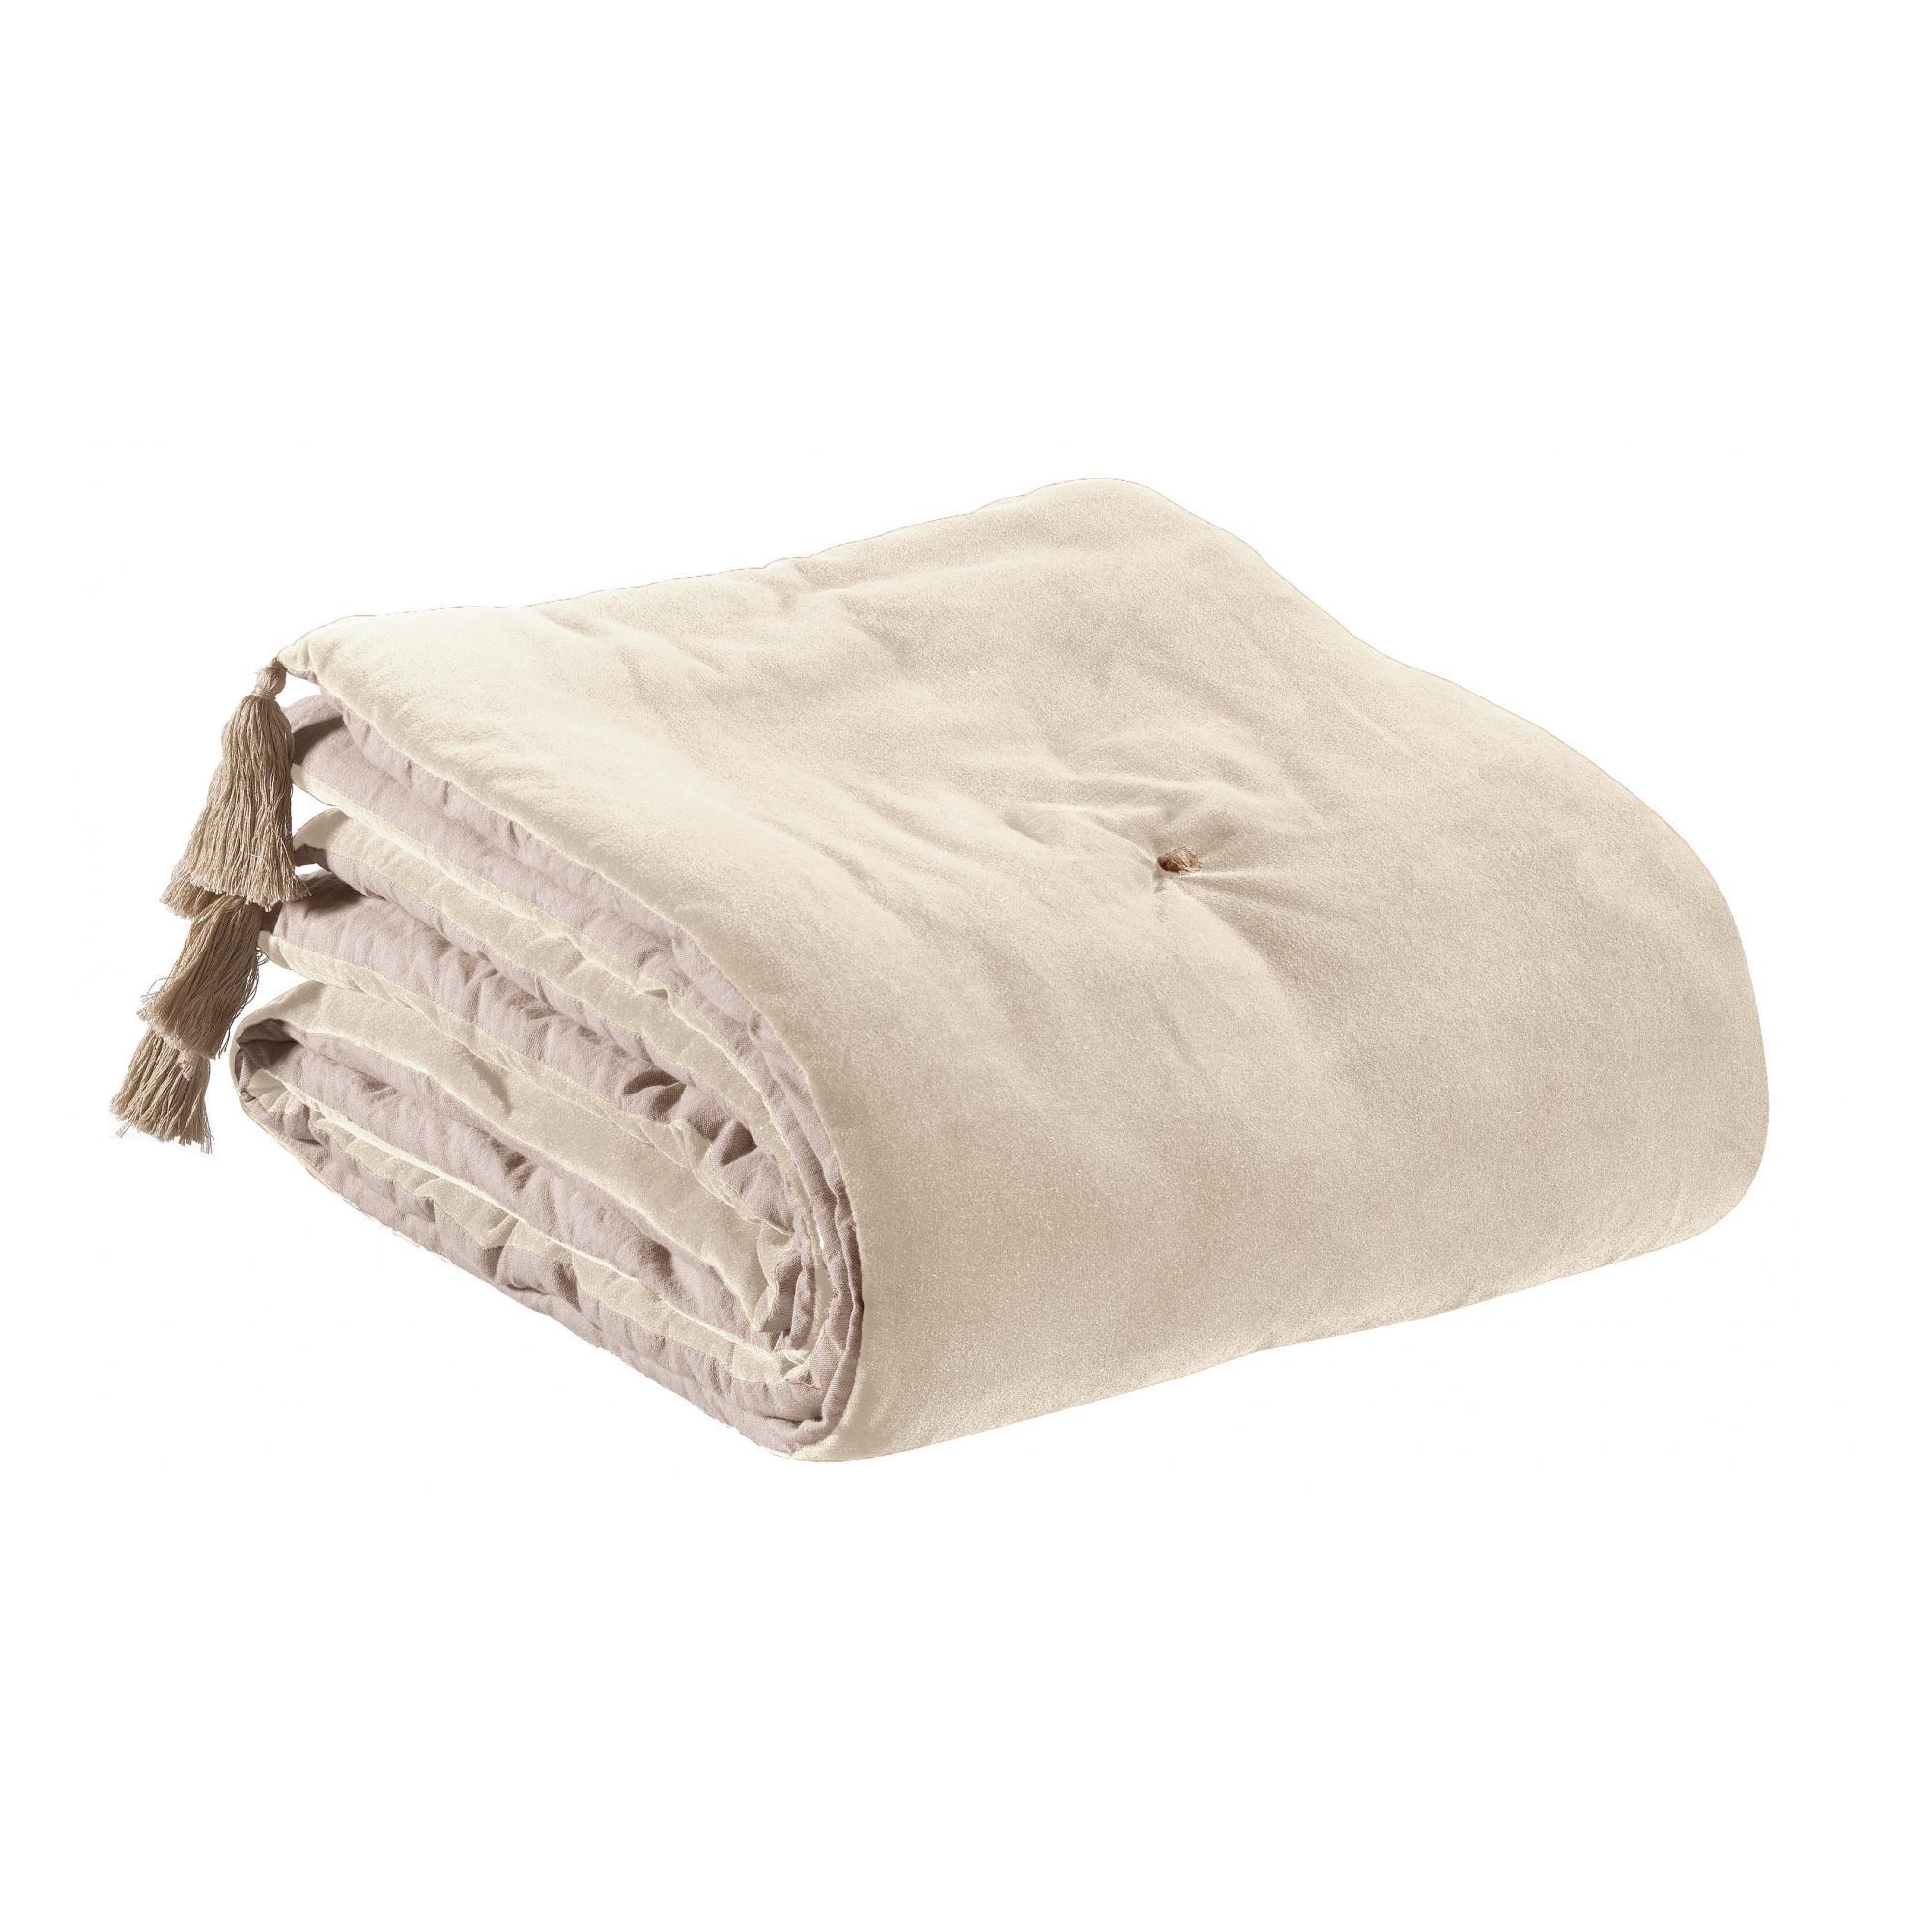 Edredon pompons  en coton grege 80 x 180